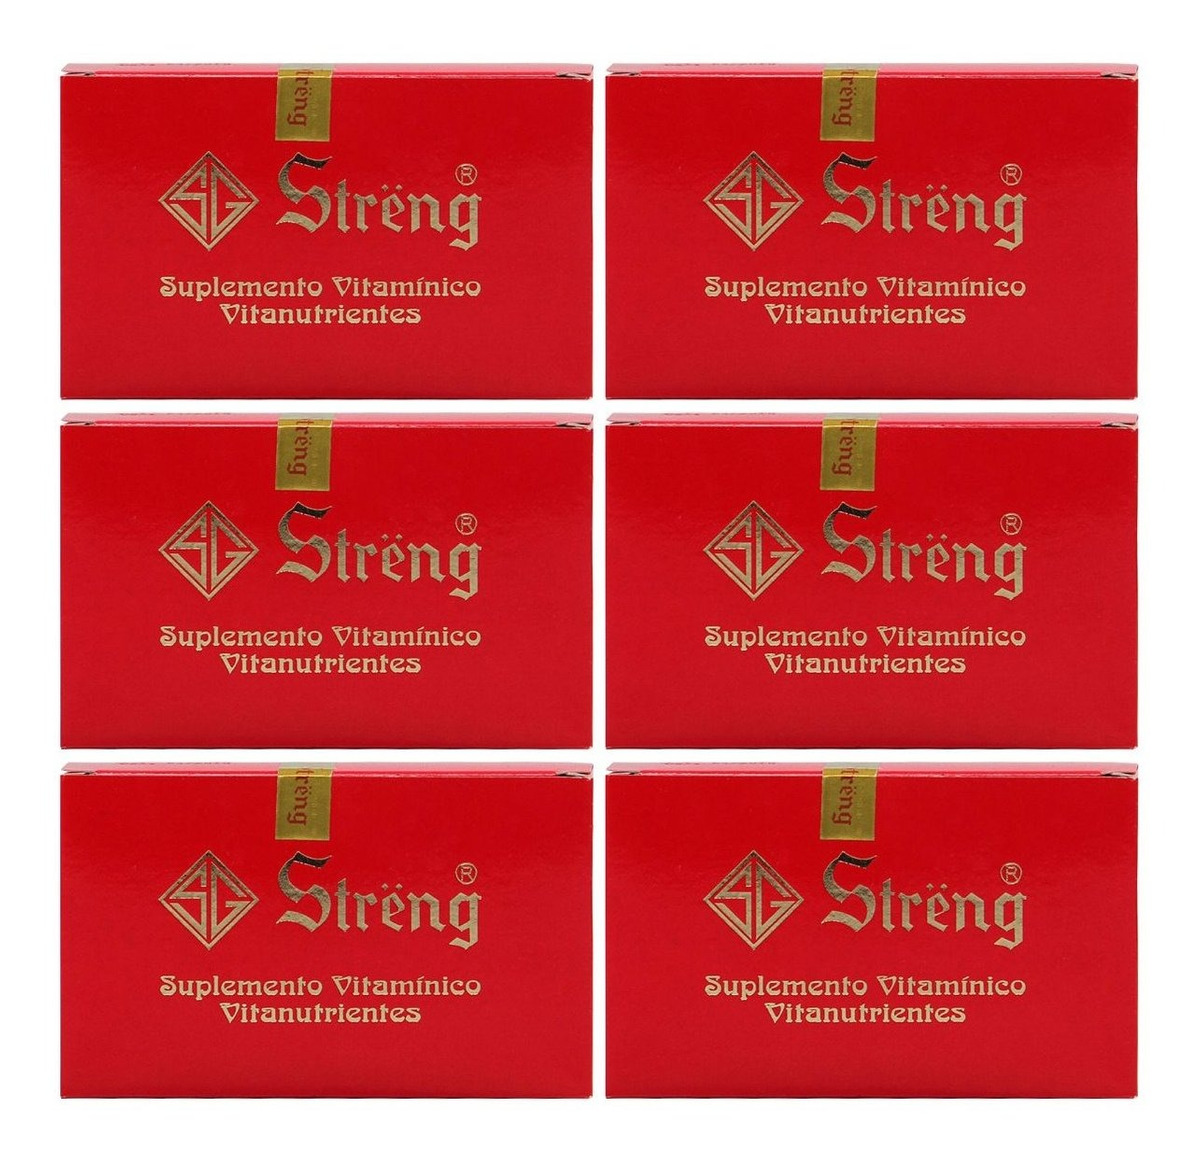 Streng Suplemento Vitaminico 16 Frascos 5ml Kit 6 Unidades